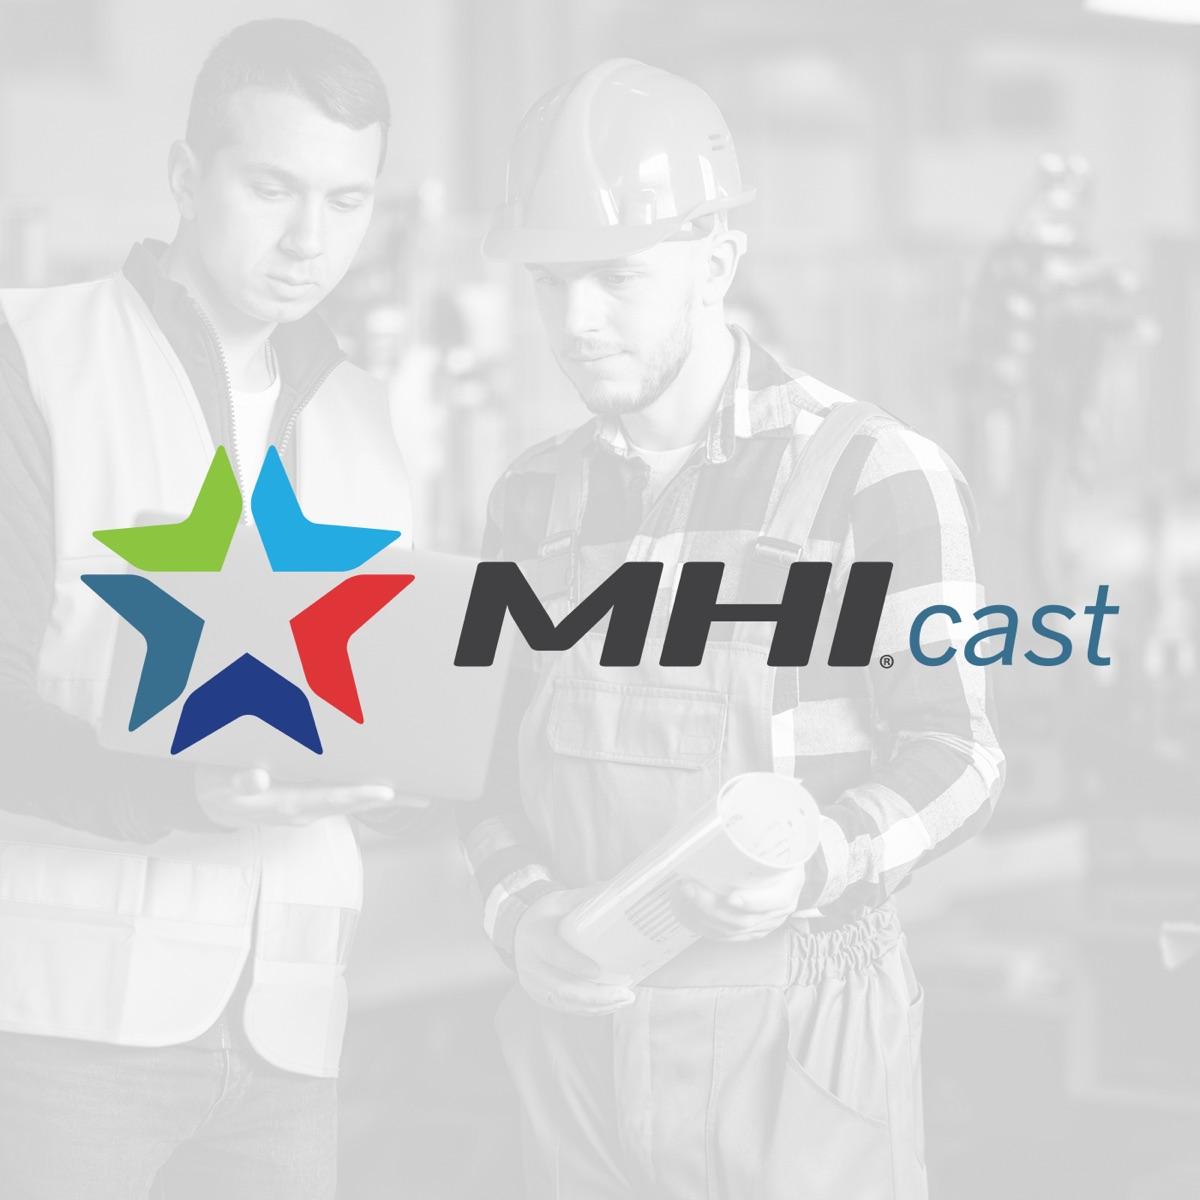 MHI cast – Podcast – Podtail